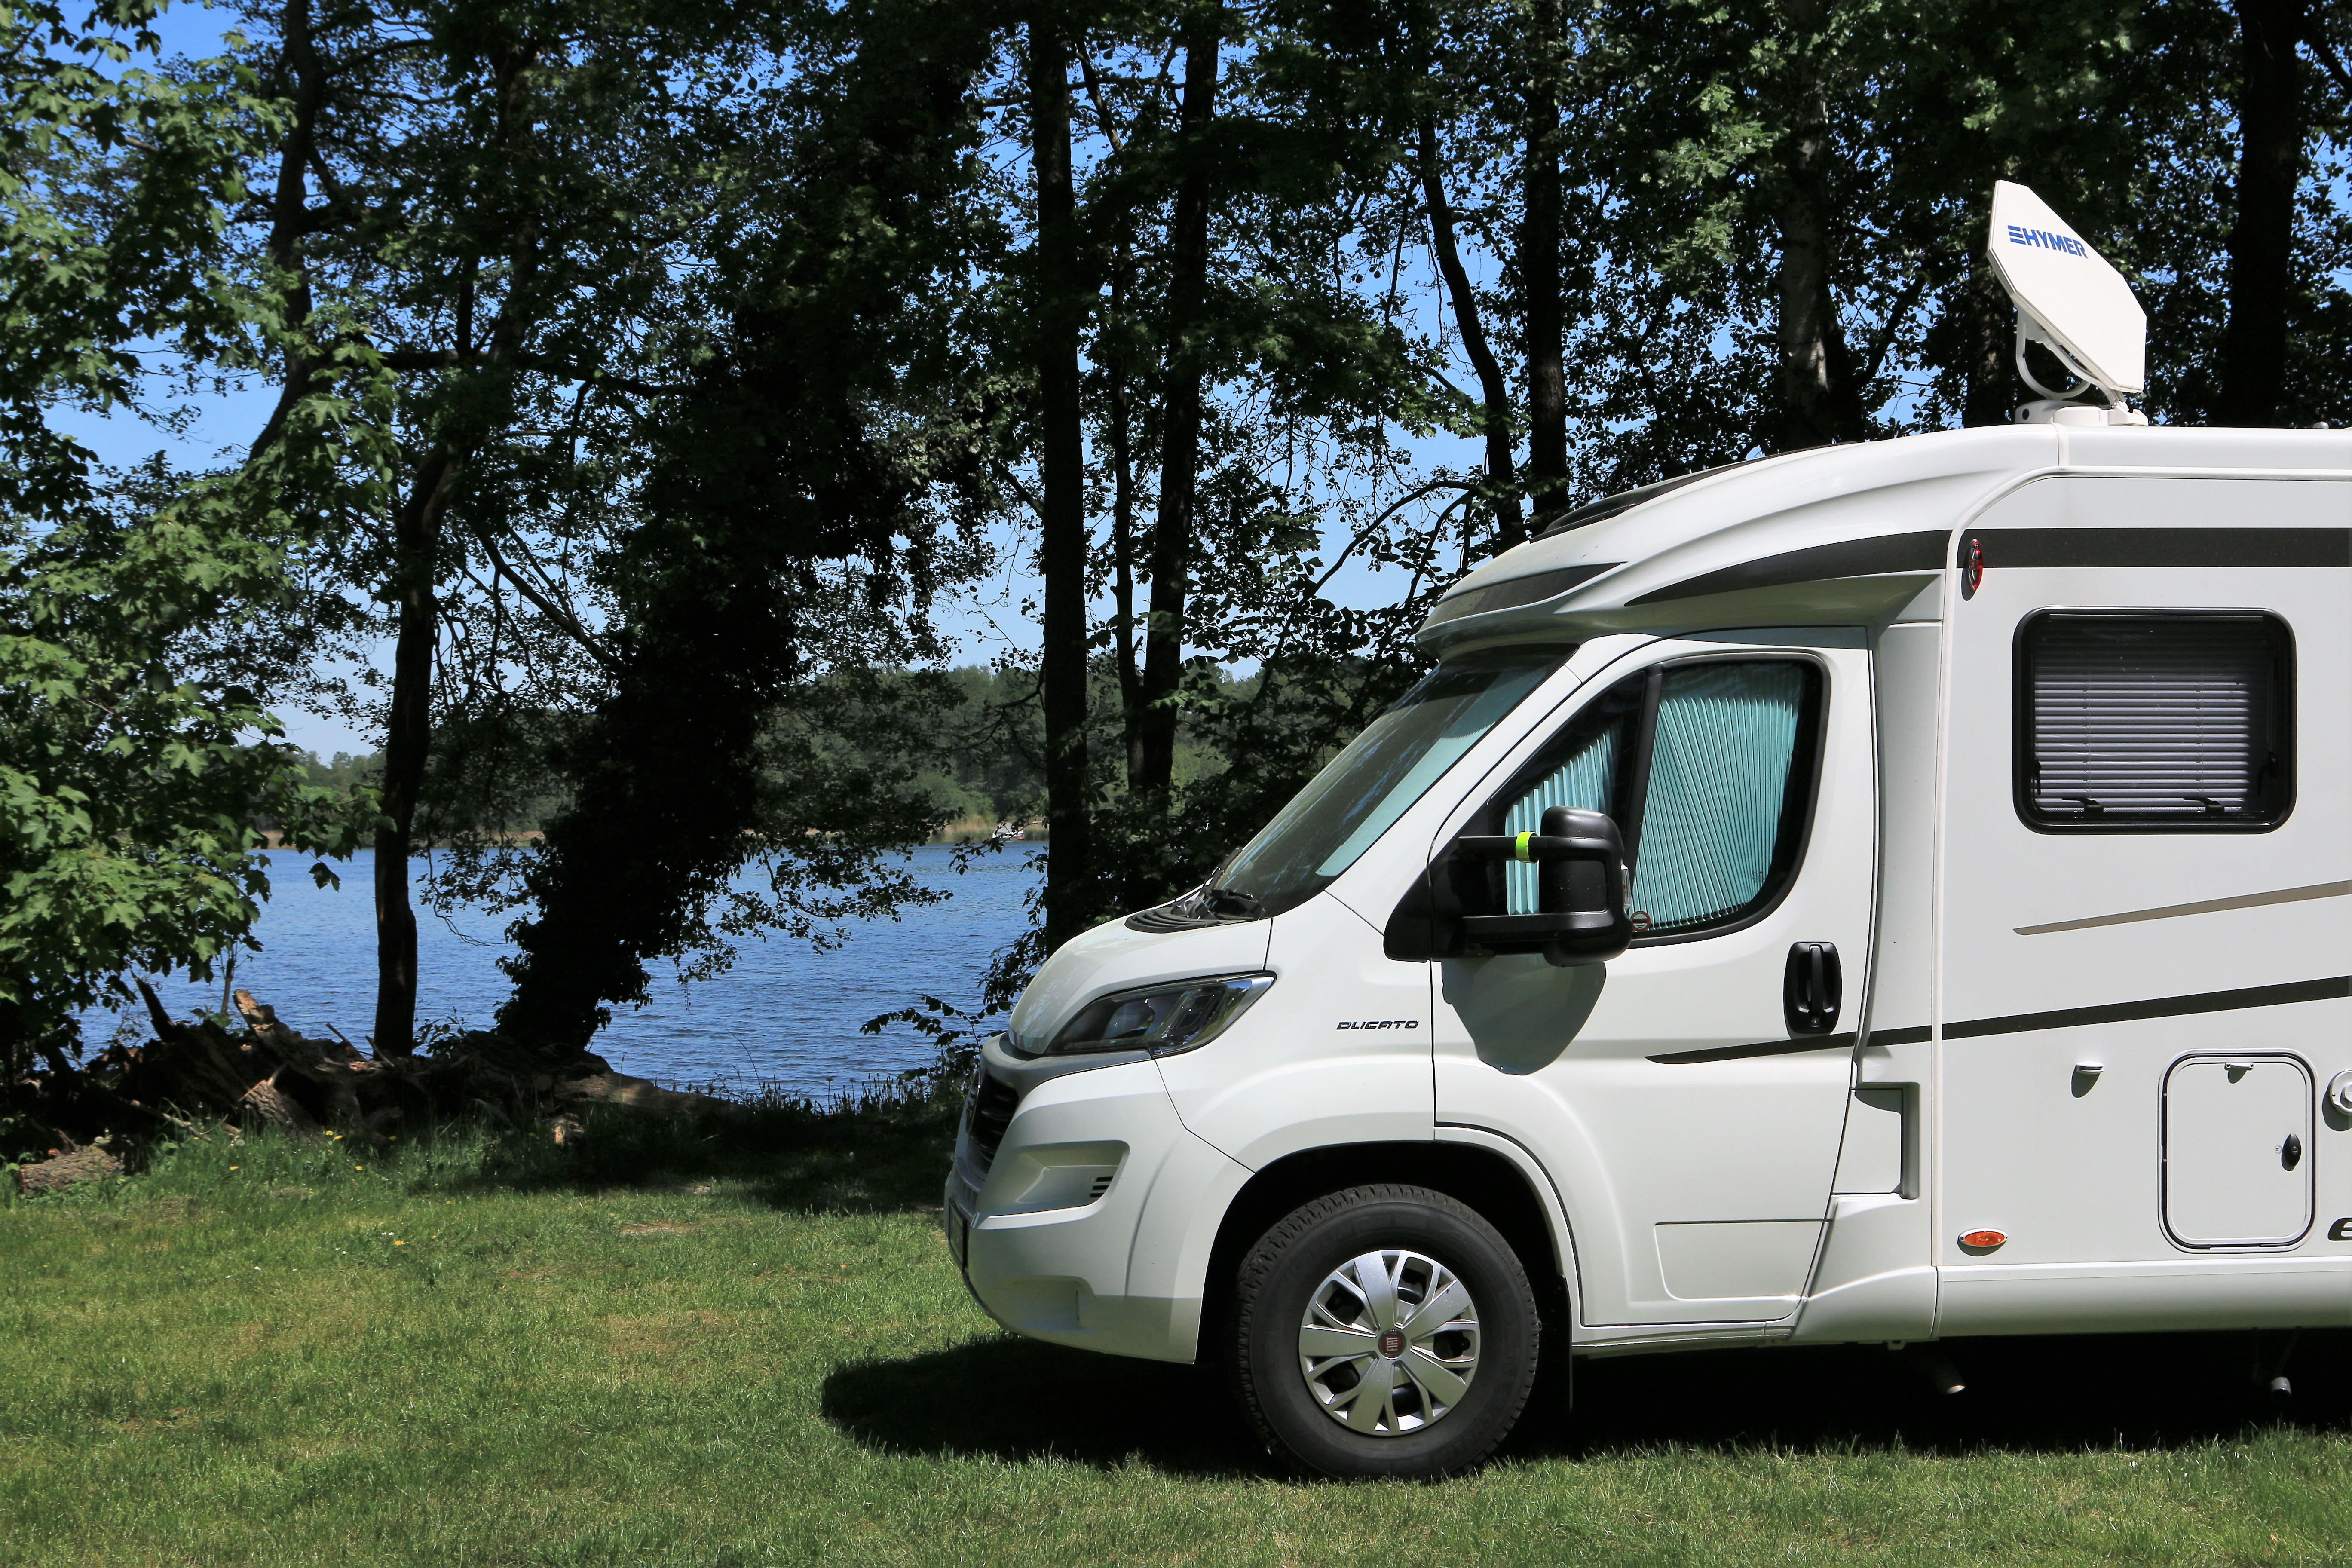 Wohnmobil Reiseberichte - Brennis Reisewelt